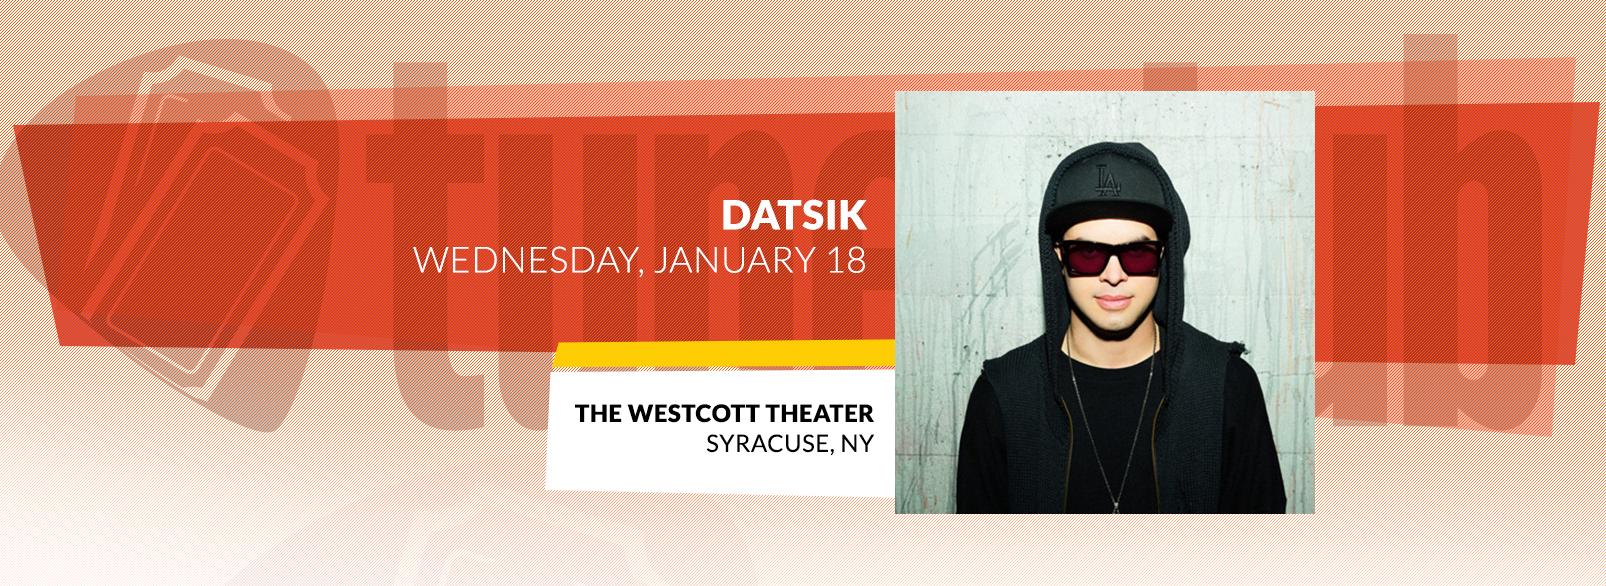 Datsik @ The Westcott Theater